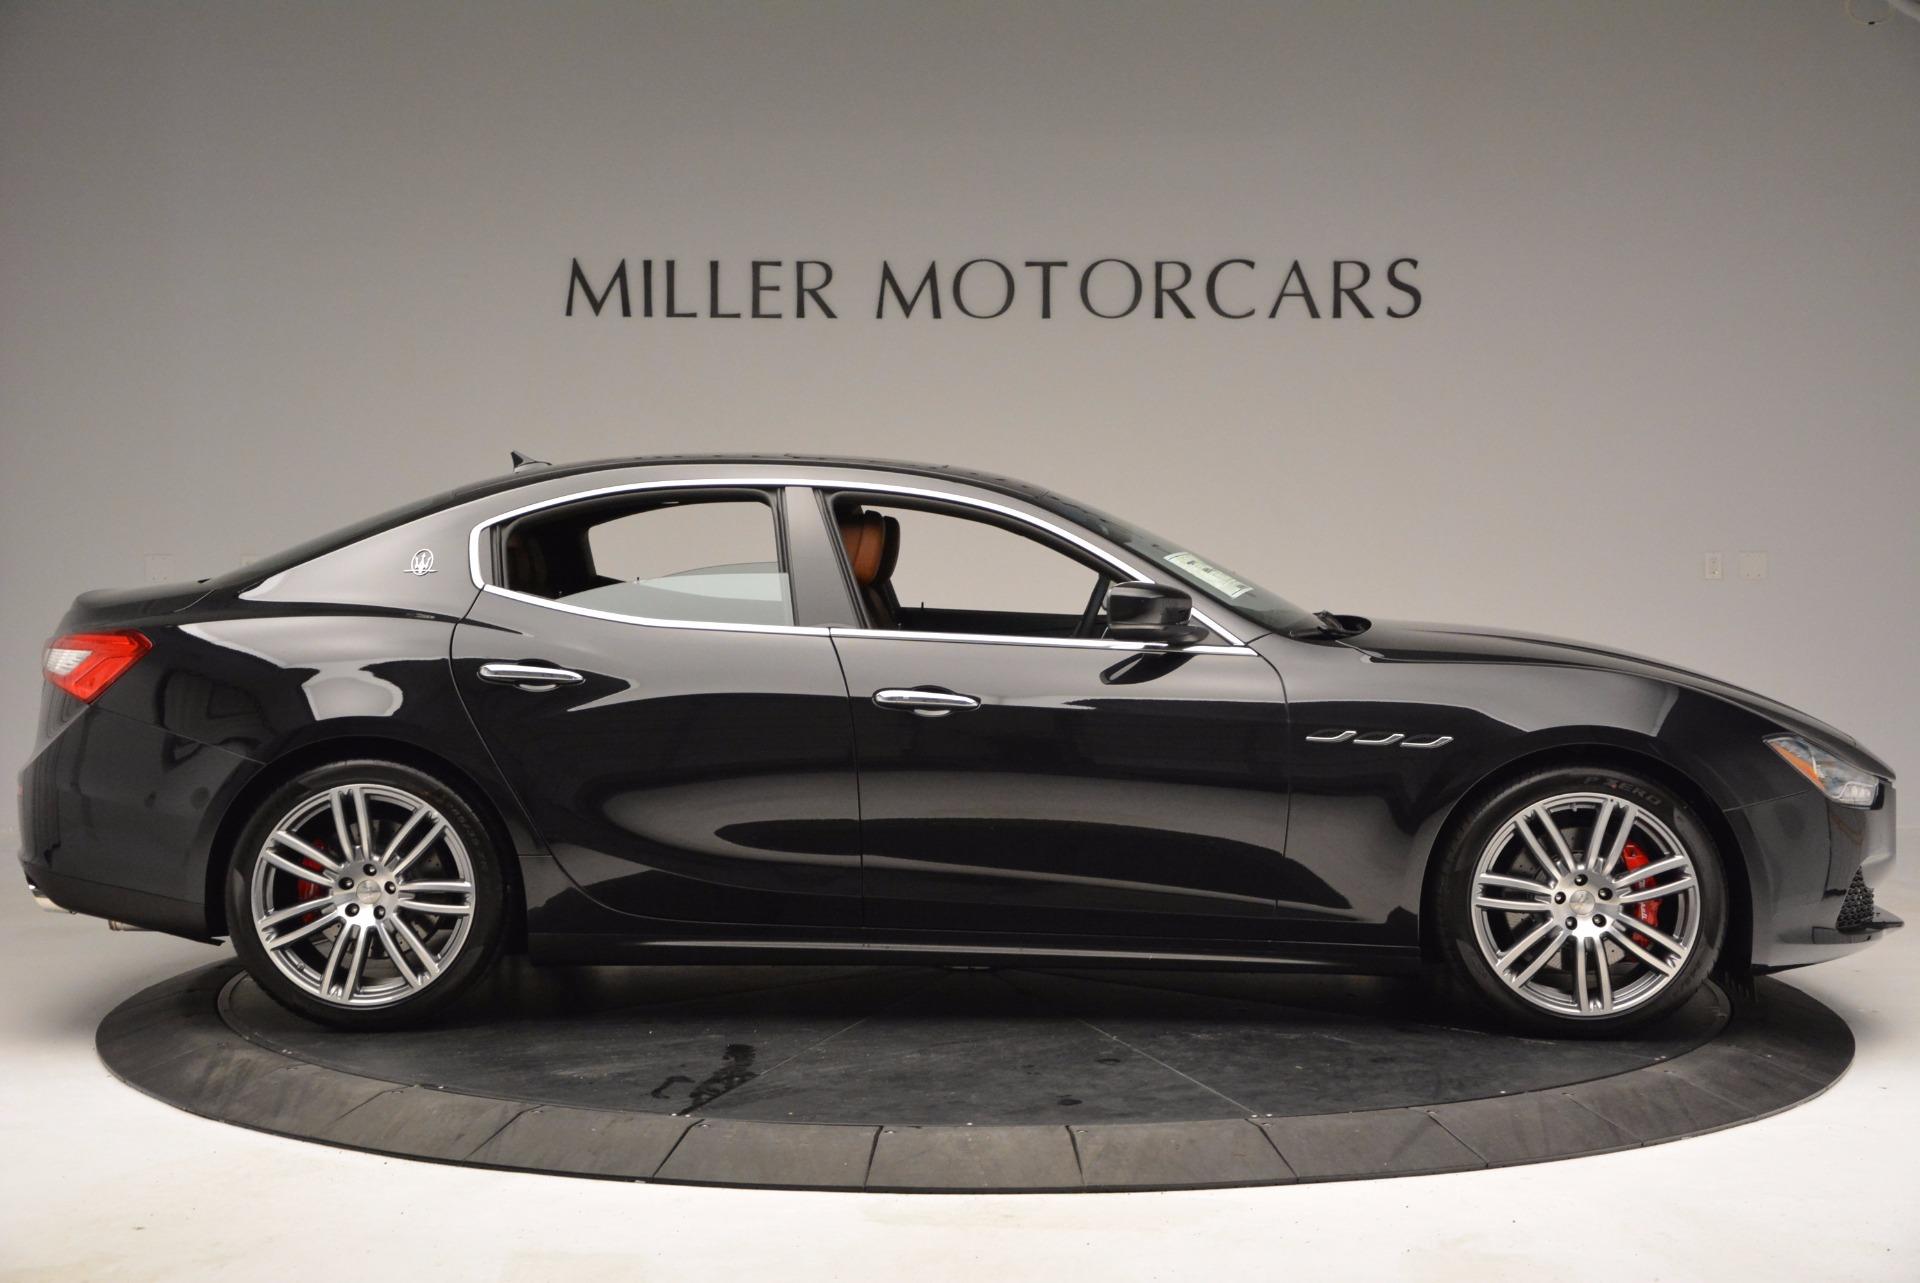 Used 2014 Maserati Ghibli S Q4 For Sale In Greenwich, CT. Alfa Romeo of Greenwich, 7249 1459_p9